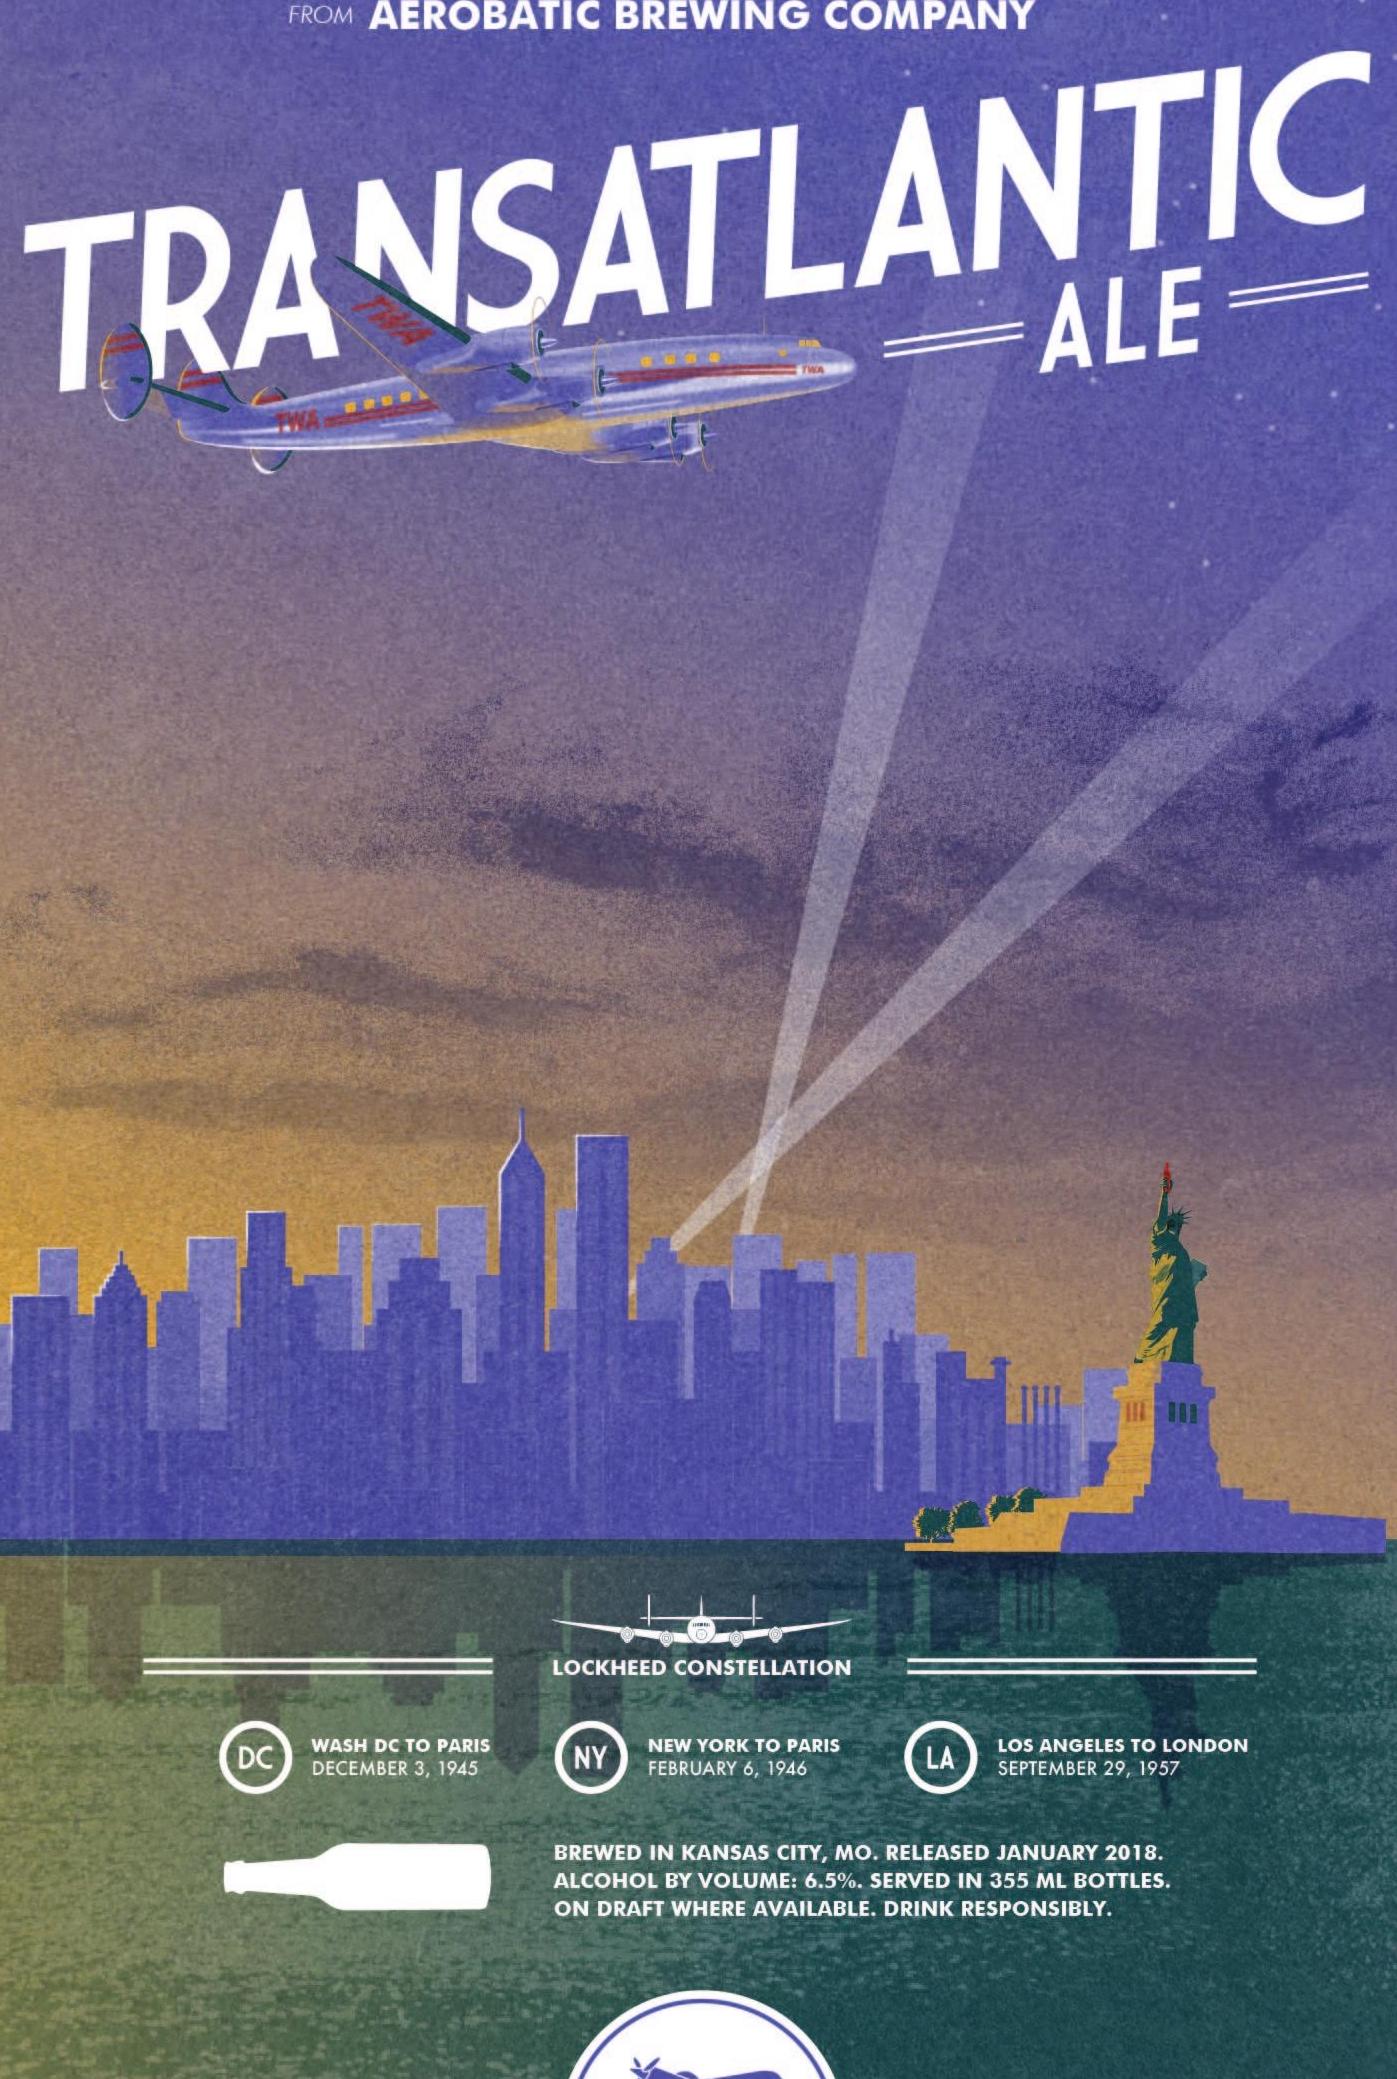 kyle-dolan-transatlantic-ale-aerobatic-brewery-design-illustration-home-thumb.jpg